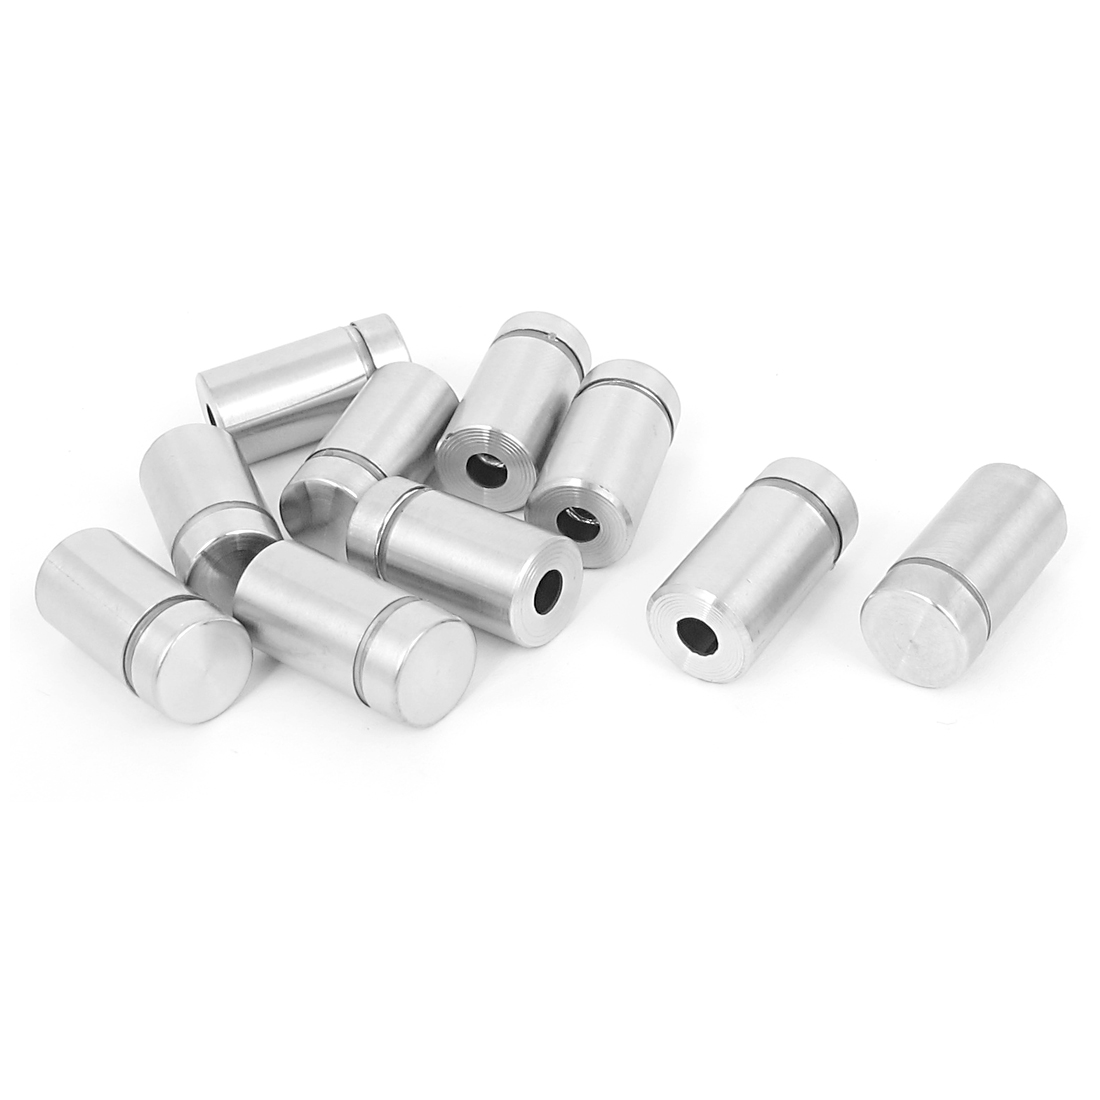 12mm x 22mm Stainless Steel Advertising Frameless Glass Standoff Pins 10pcs